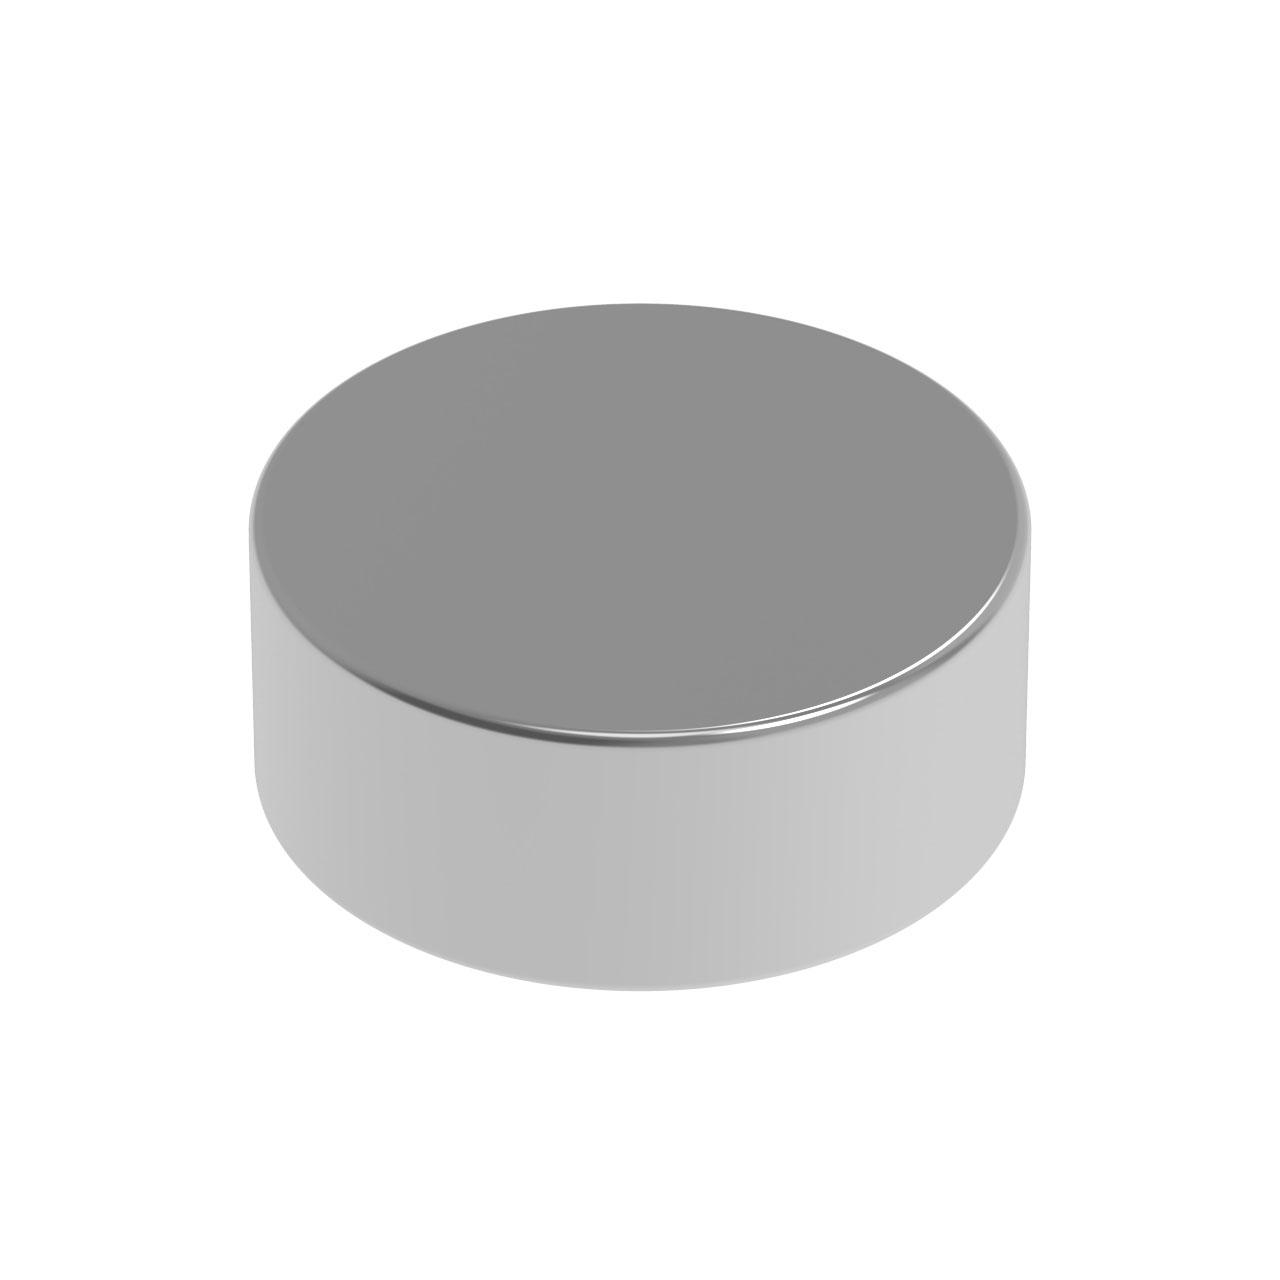 HIQPARTS(ハイキューパーツ) ネオジム磁石 N52 丸形 直径5mm x 高さ2mm(10個入) [MGN5020] 4582370700651